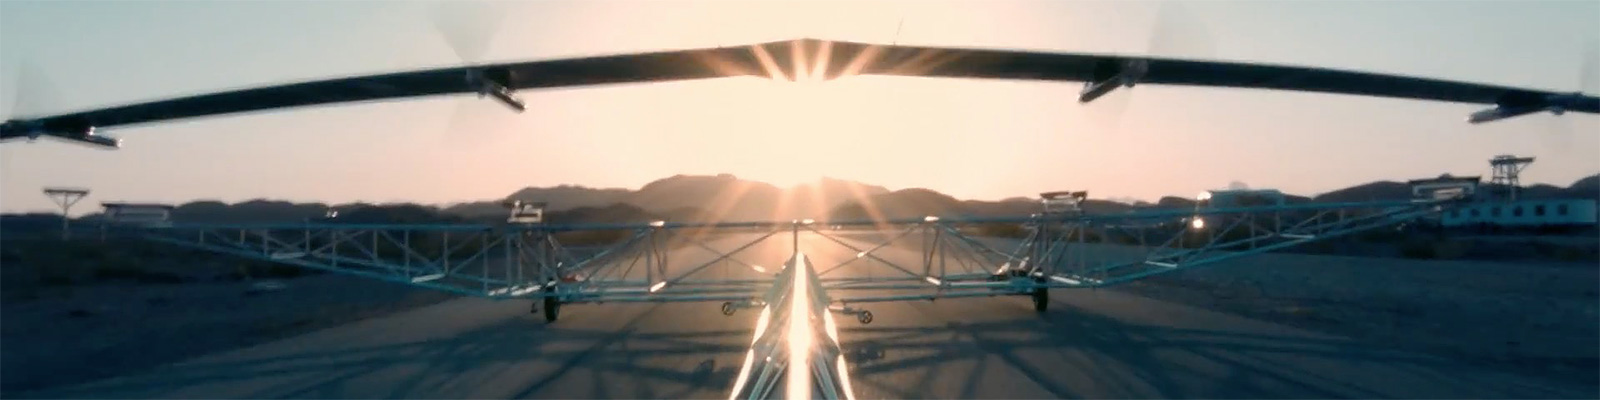 Aquila's First Flight(Facebook)